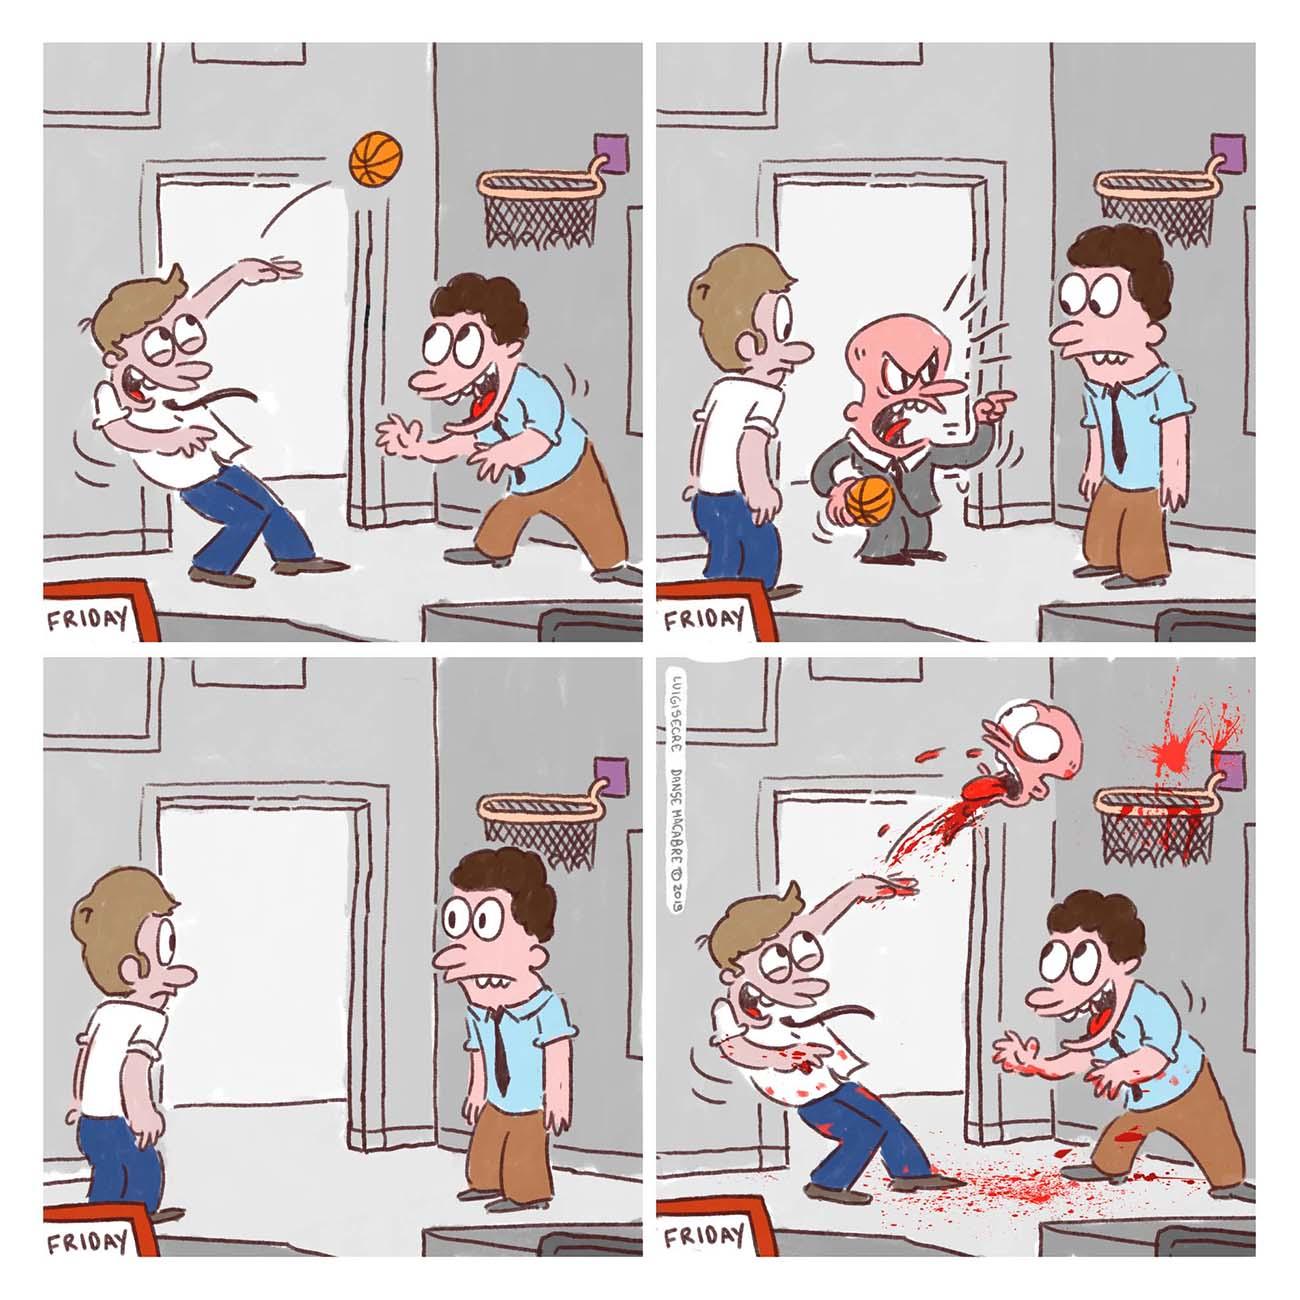 Contenuti_Low_Res_Luigi_Segre_Cartoons_2019_Danse_Macabre_20.jpg